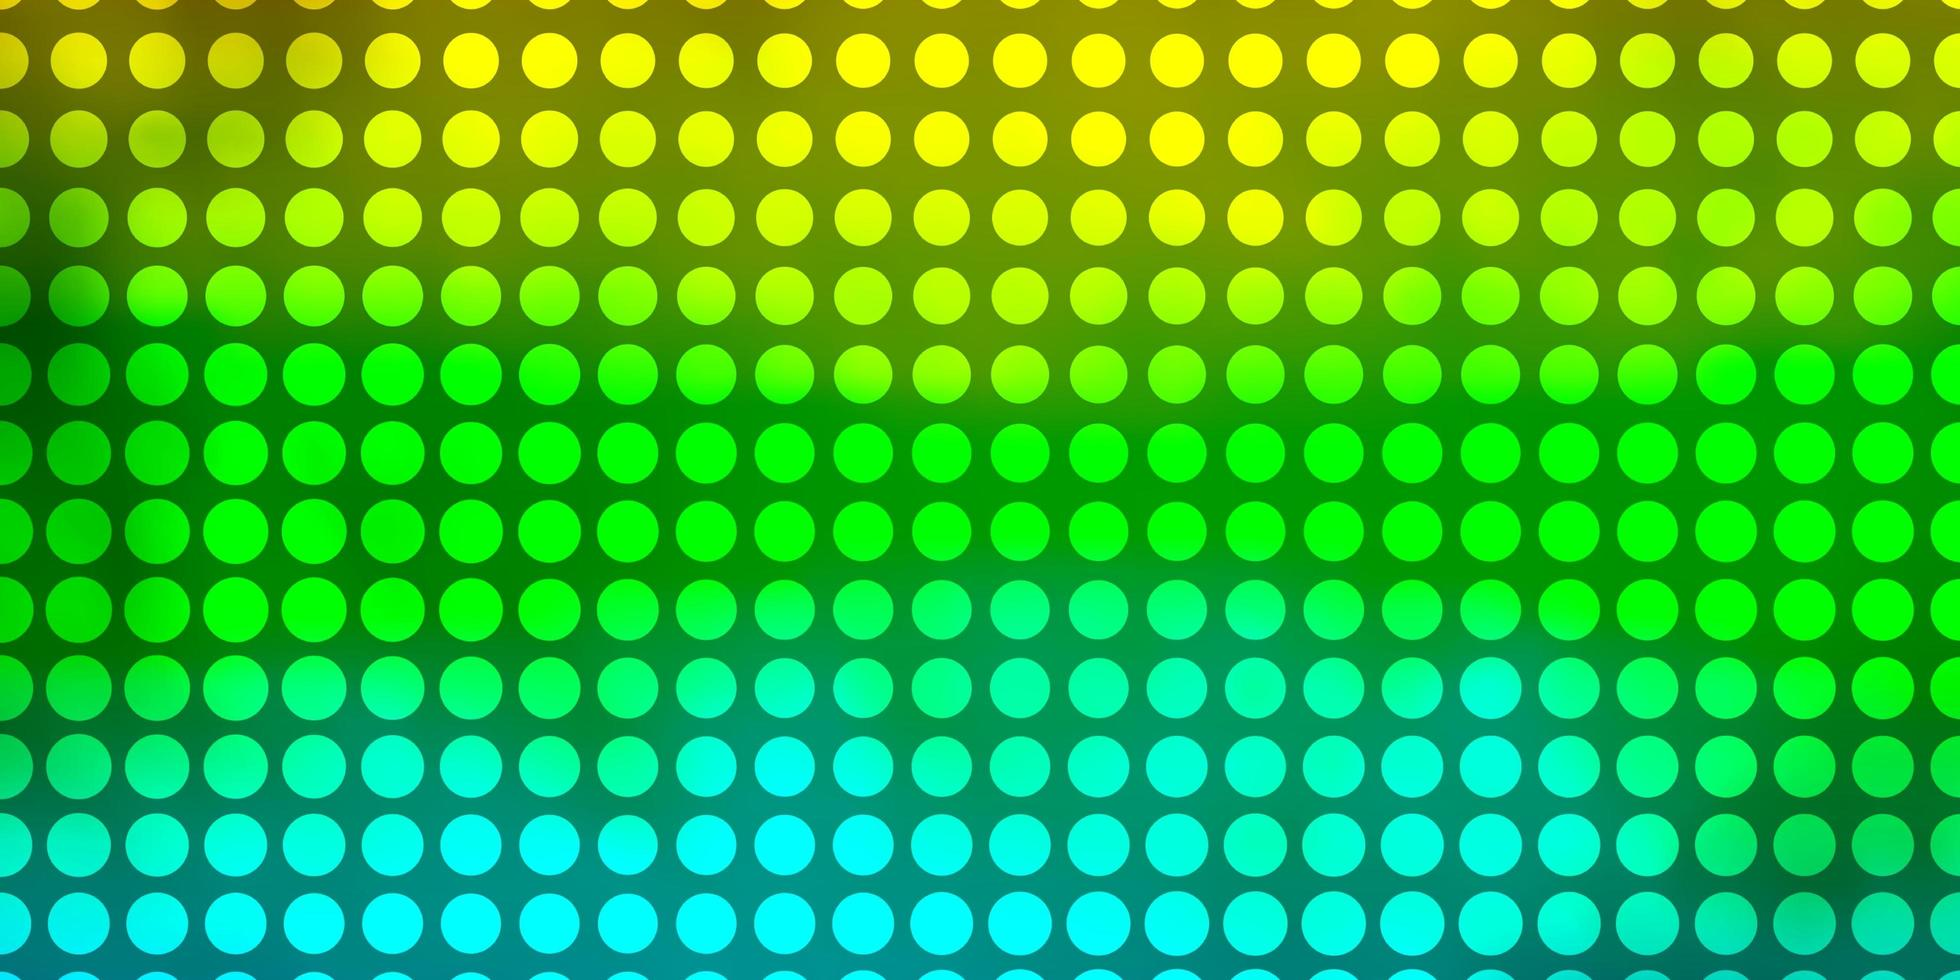 pano de fundo vector azul e amarelo claro com círculos.